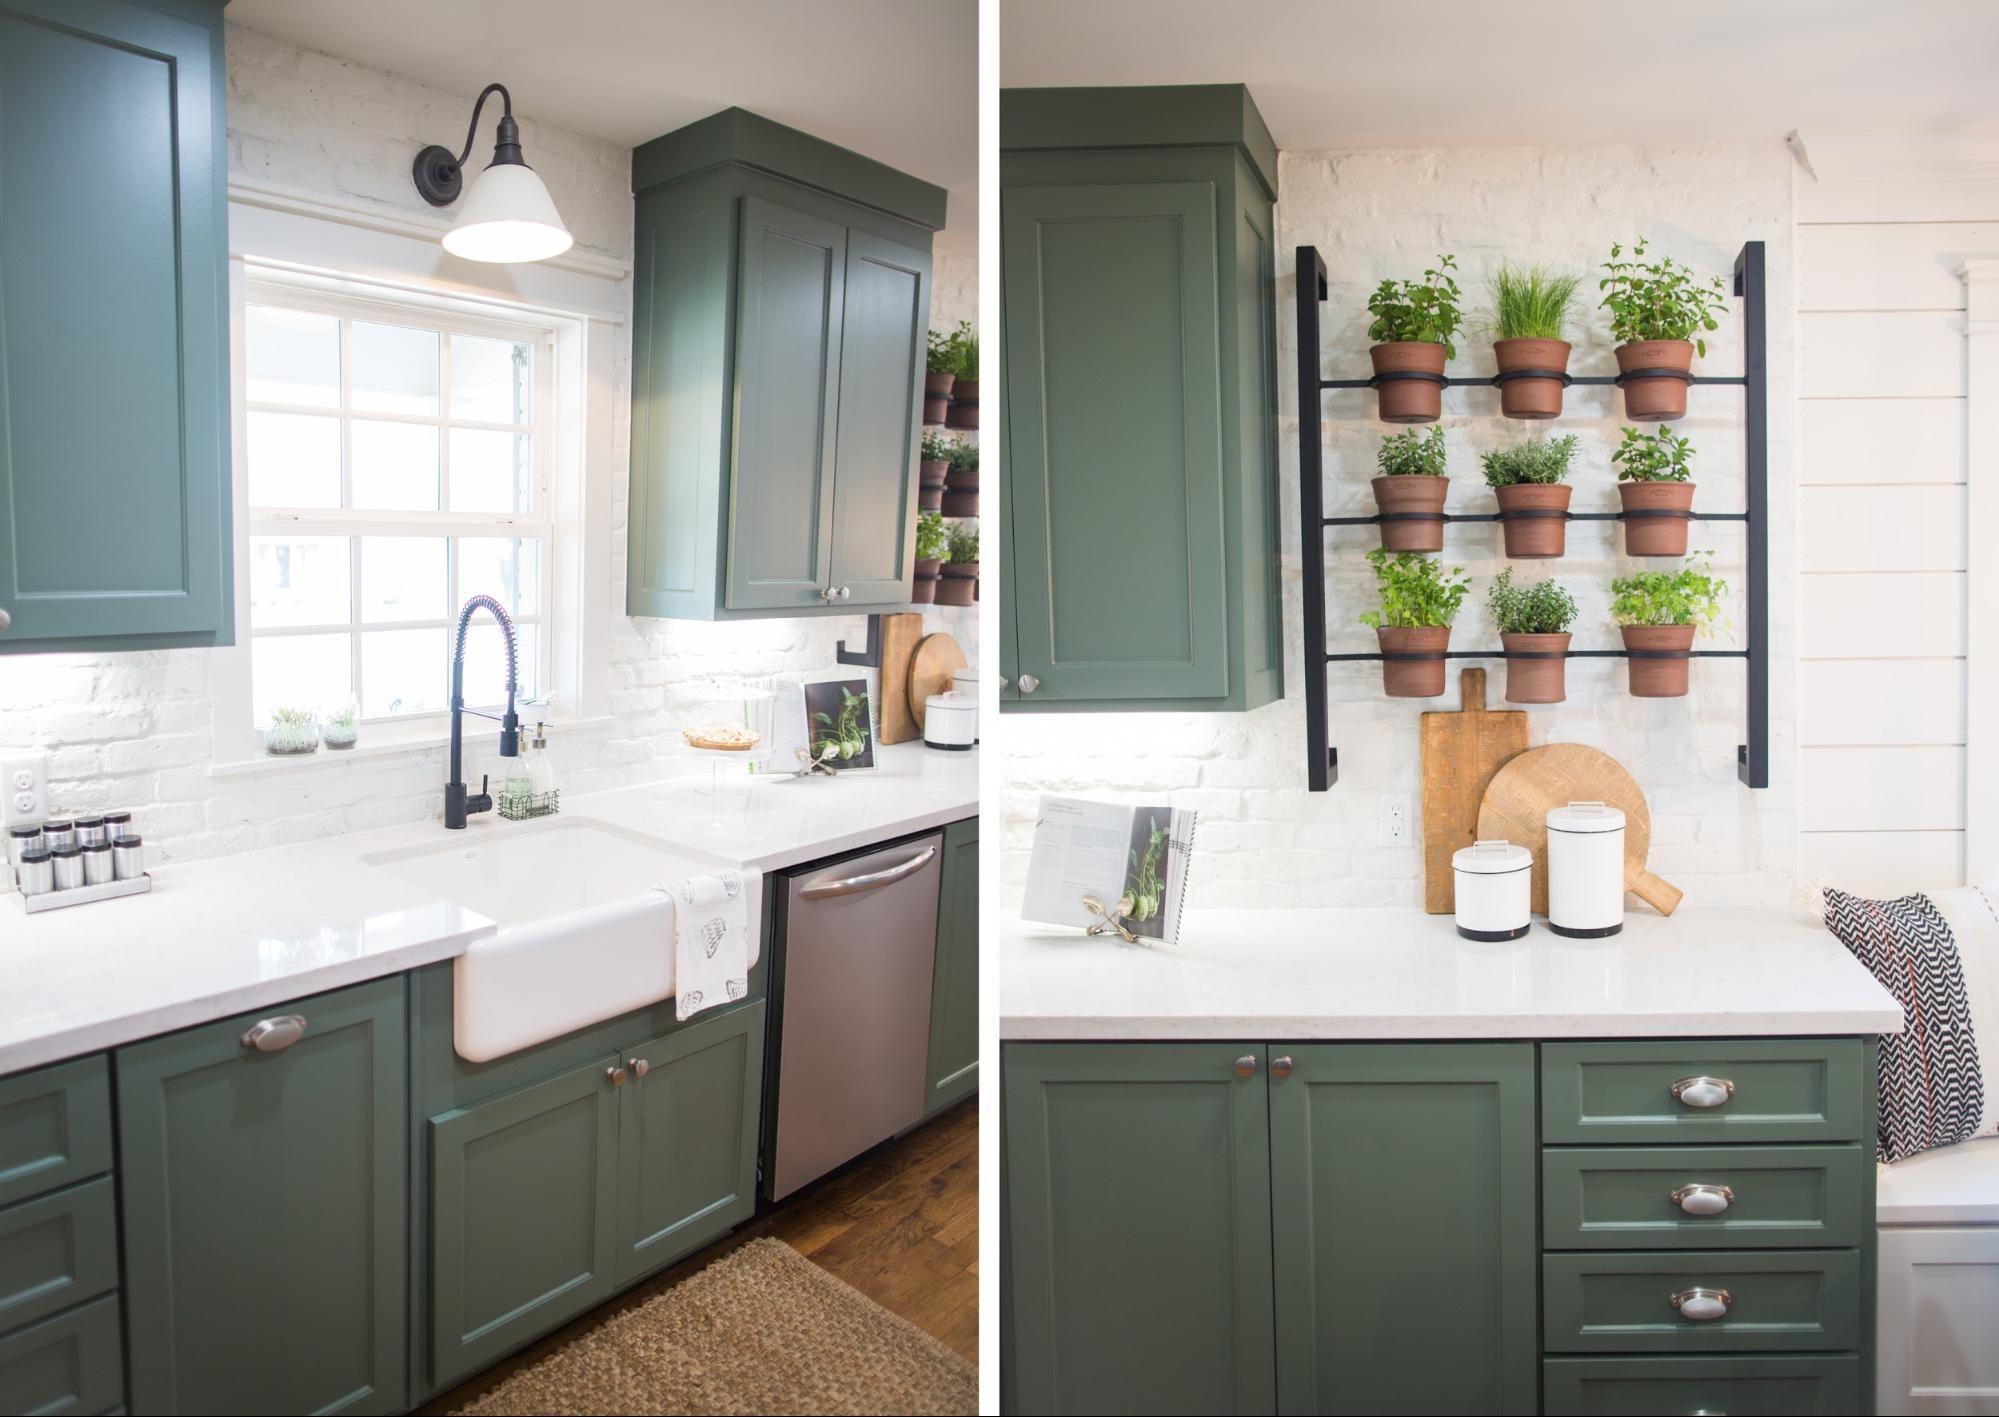 Fixer Upper | Faucet, Sinks and Walls